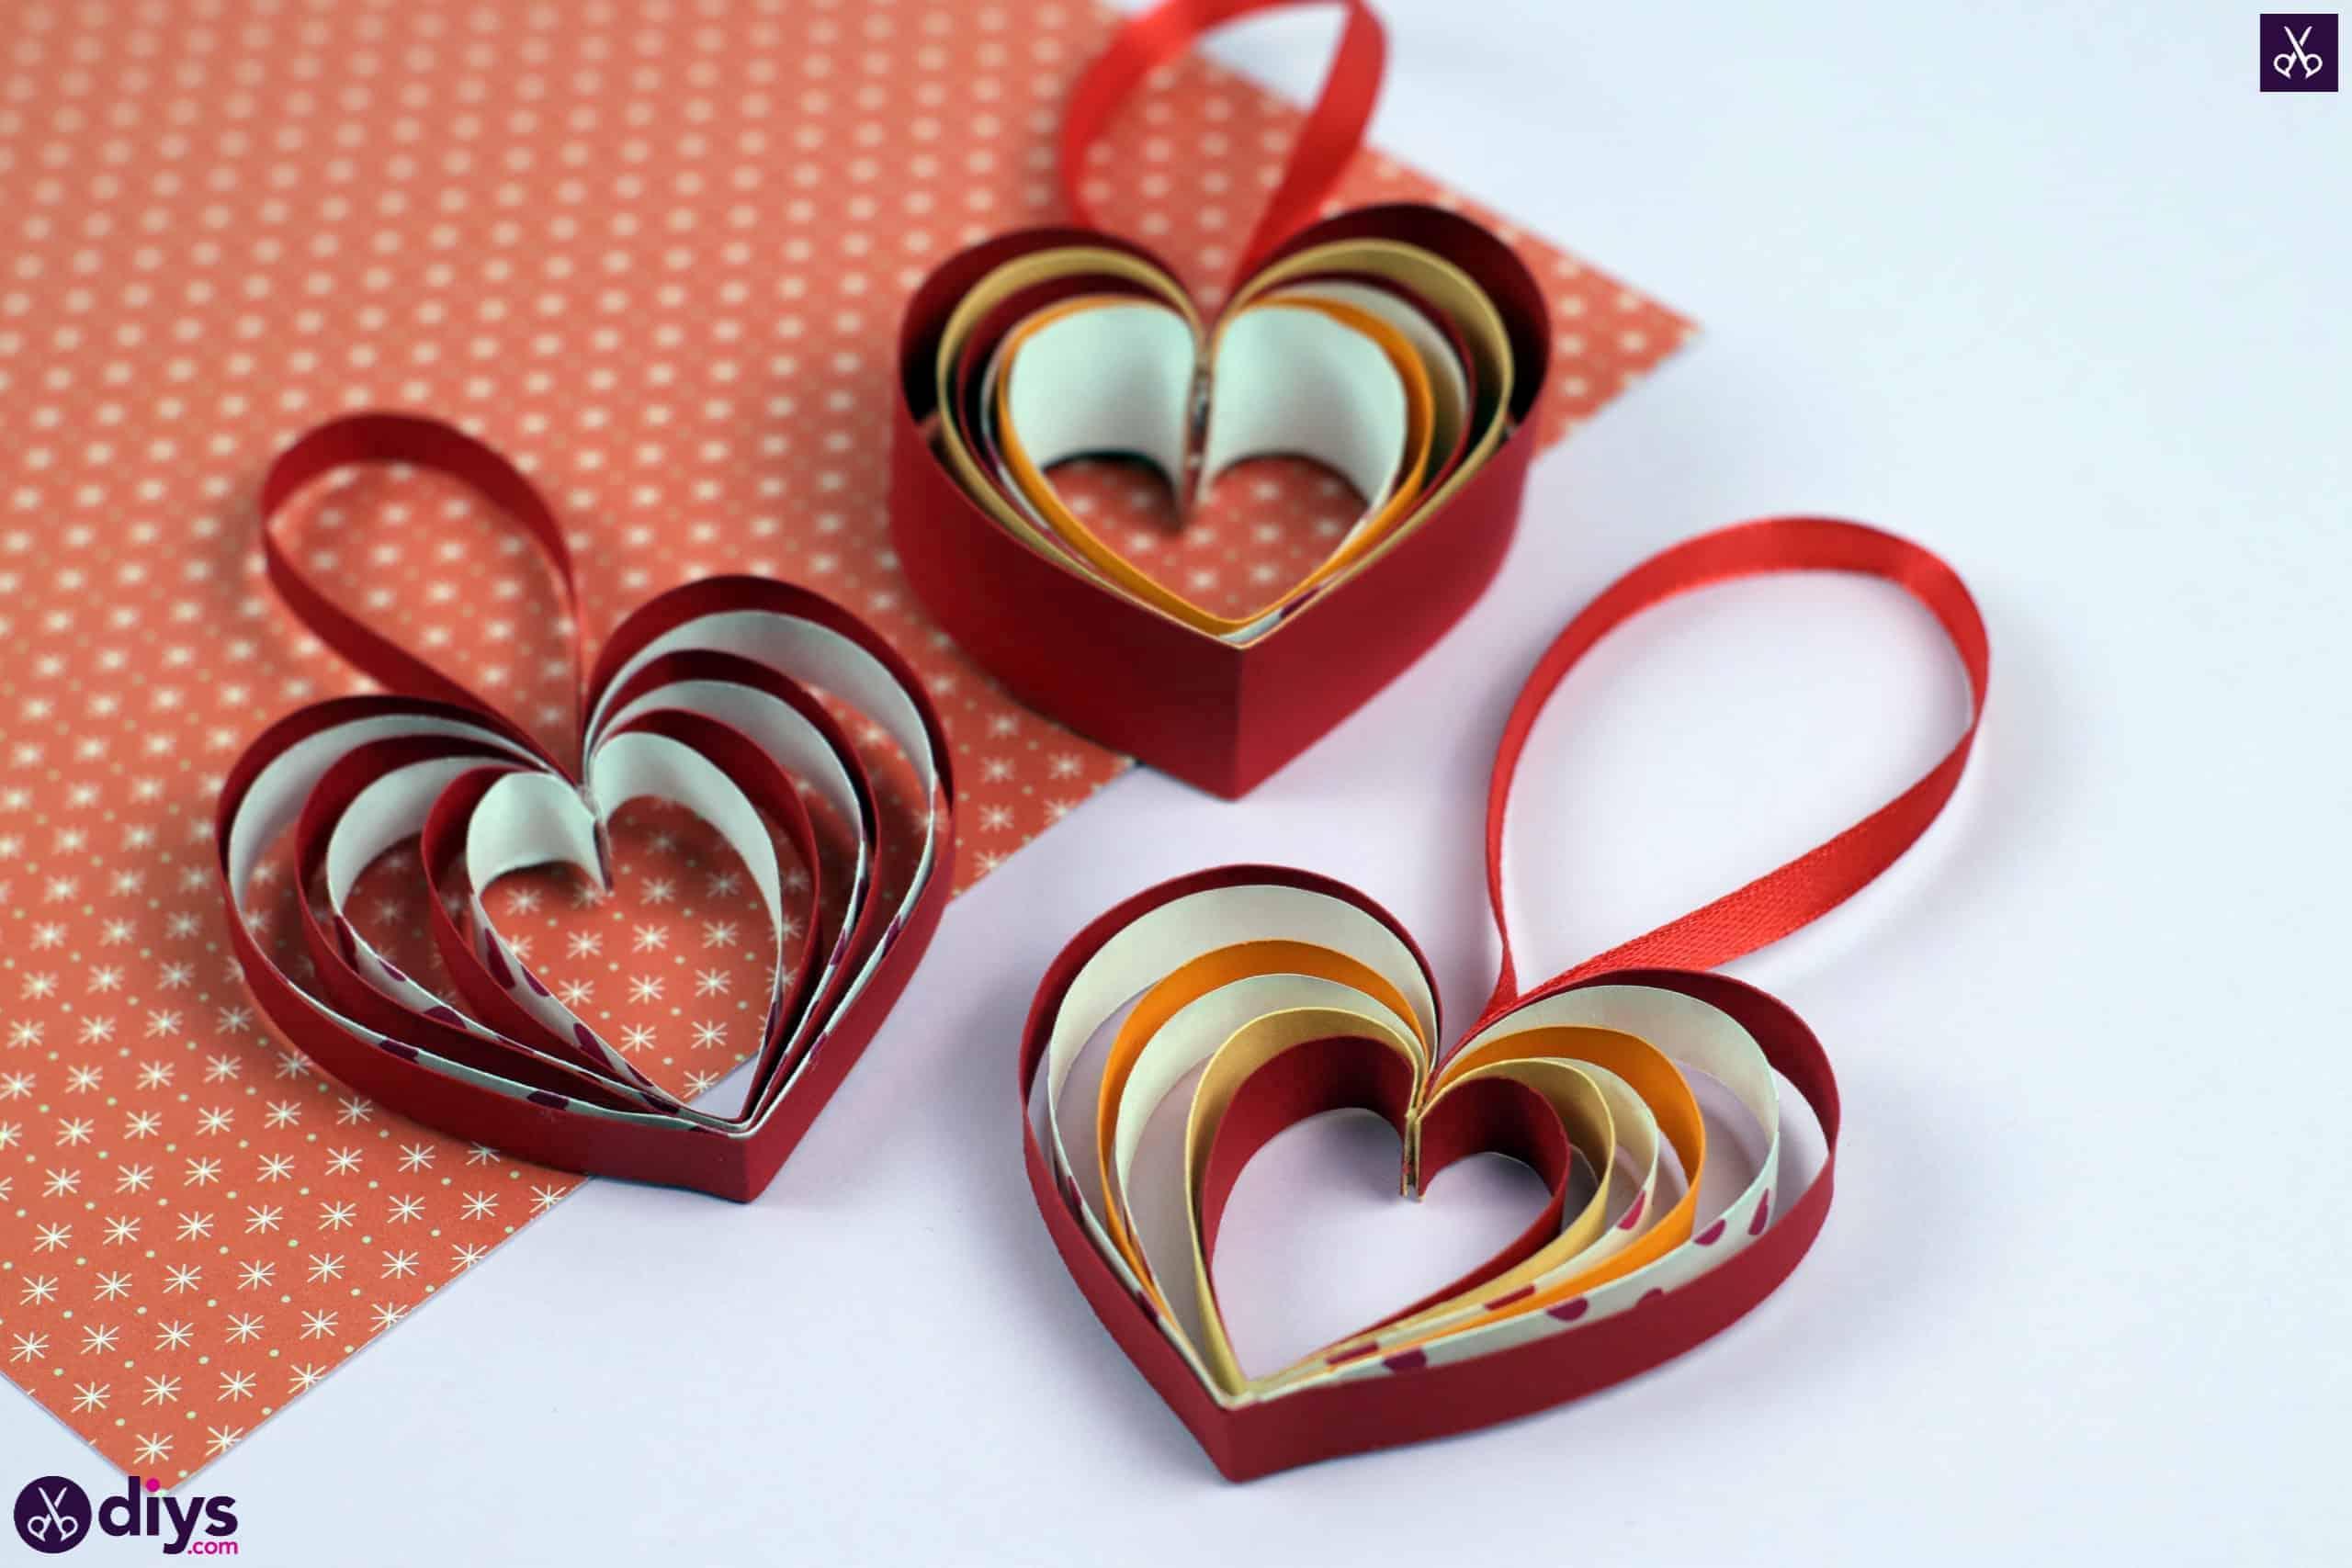 Diy ribbon heart step 9c